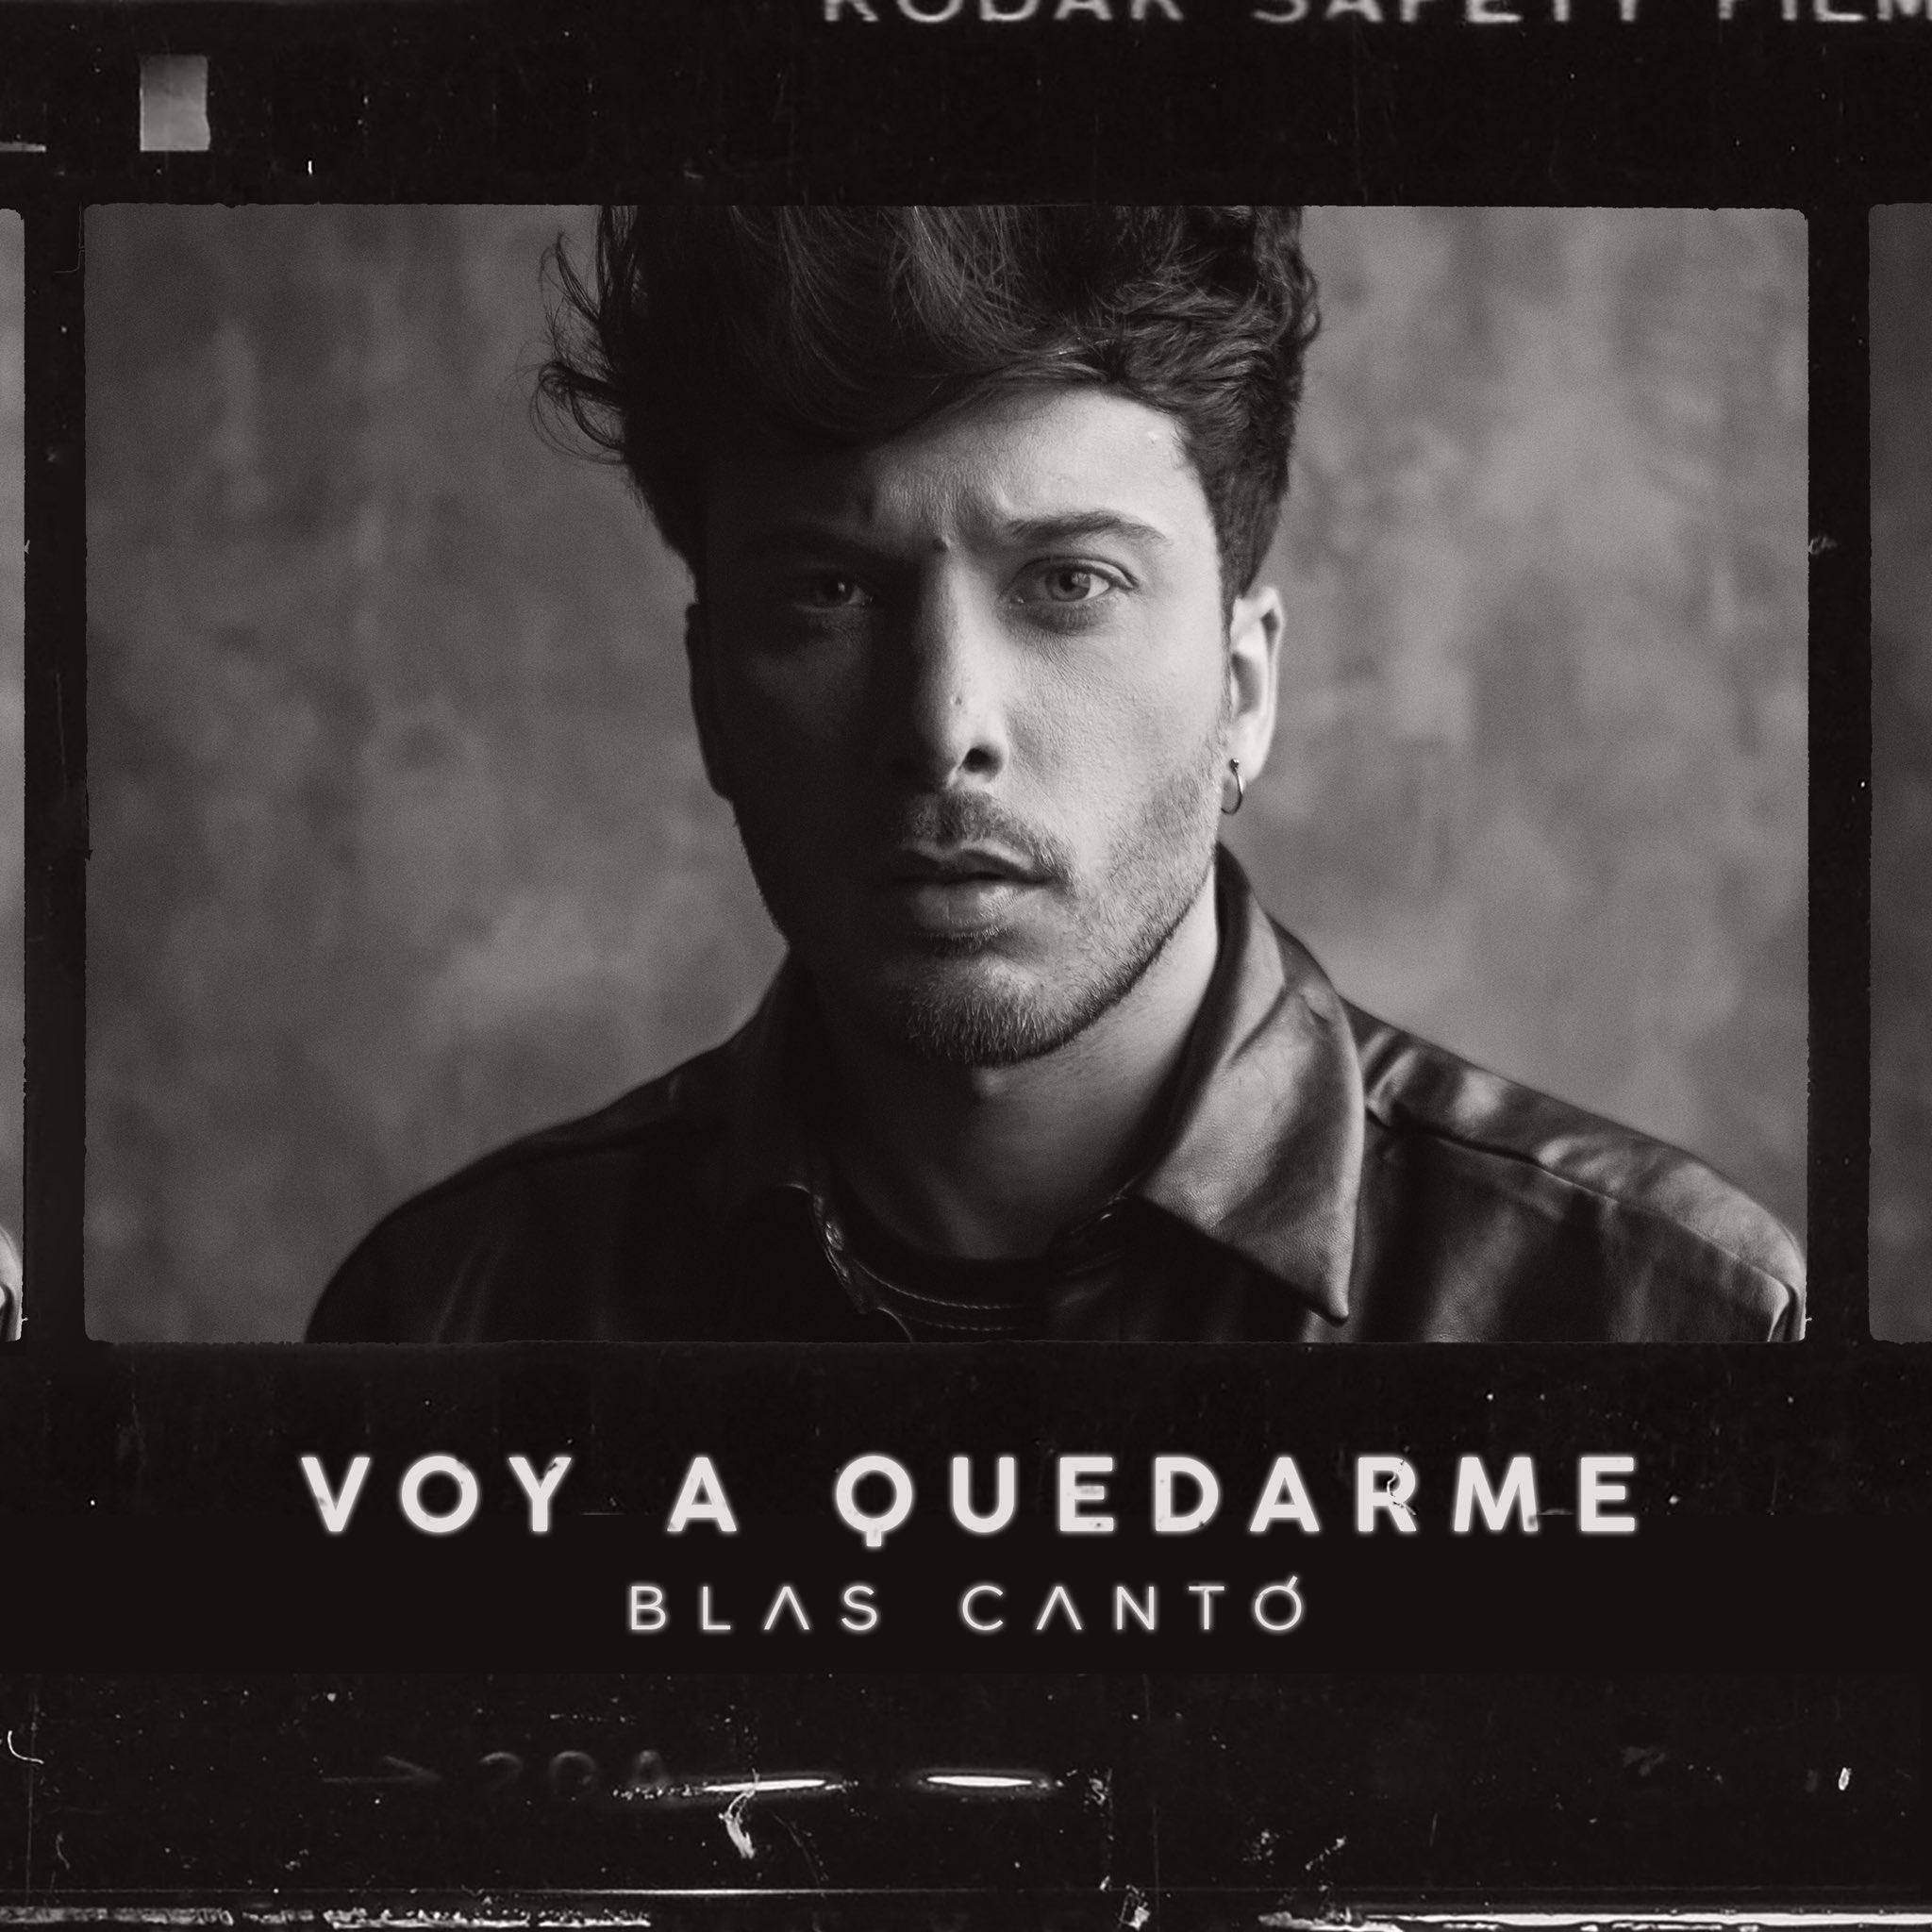 "Blas Cantó >> eurovisión ""Voy A Quedarme""  - Página 2 Ets90xkWgAUQ40p?format=jpg&name=large"